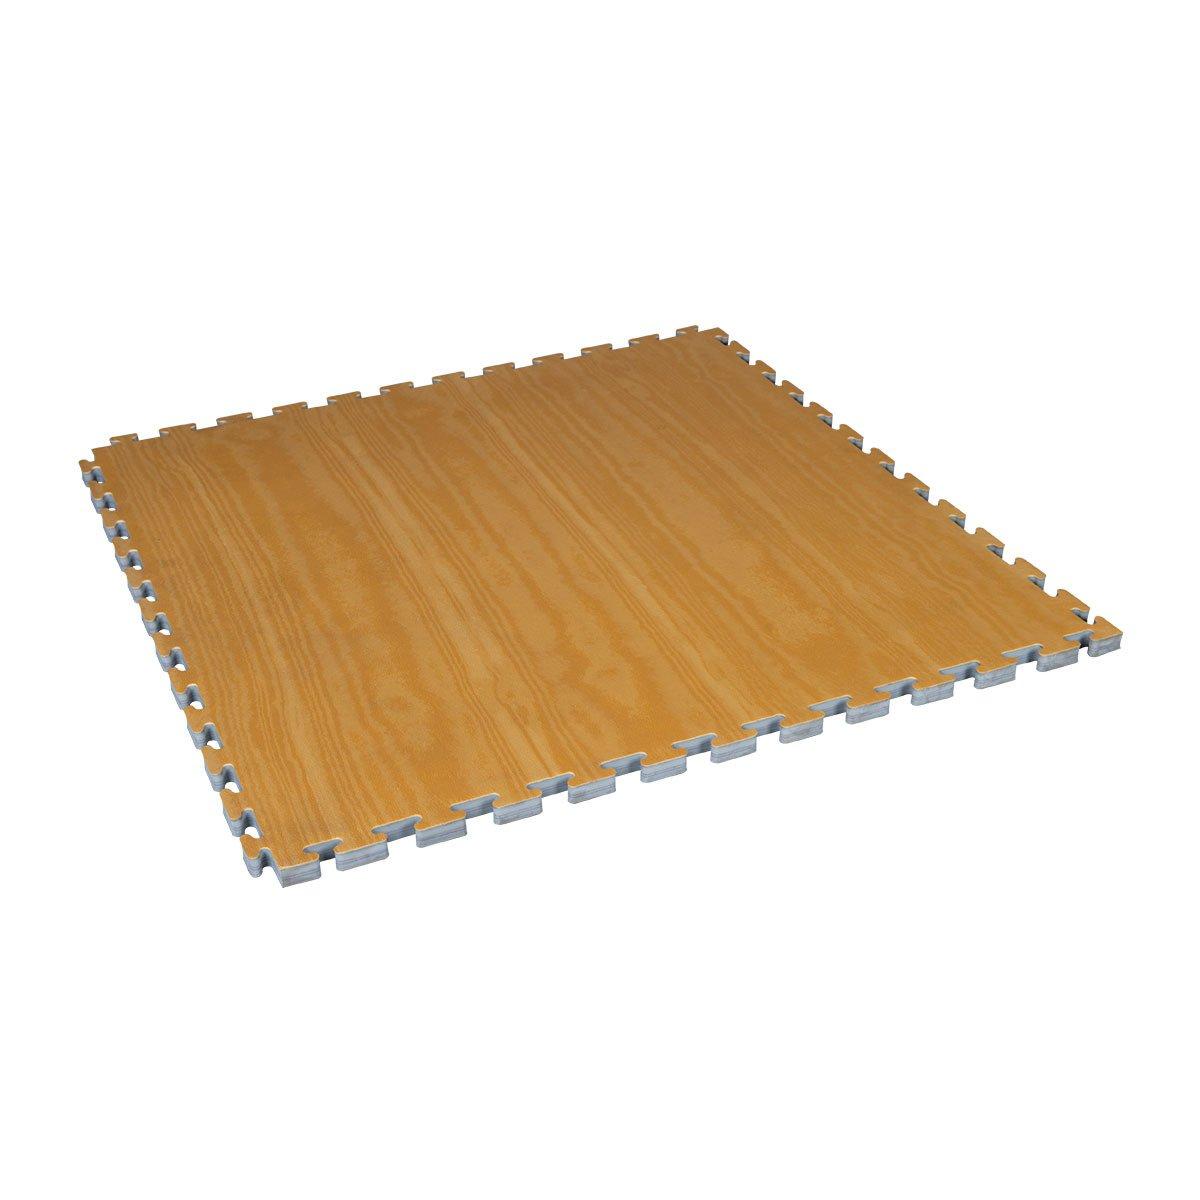 Century® Wood Grain Reversible Puzzle Mat